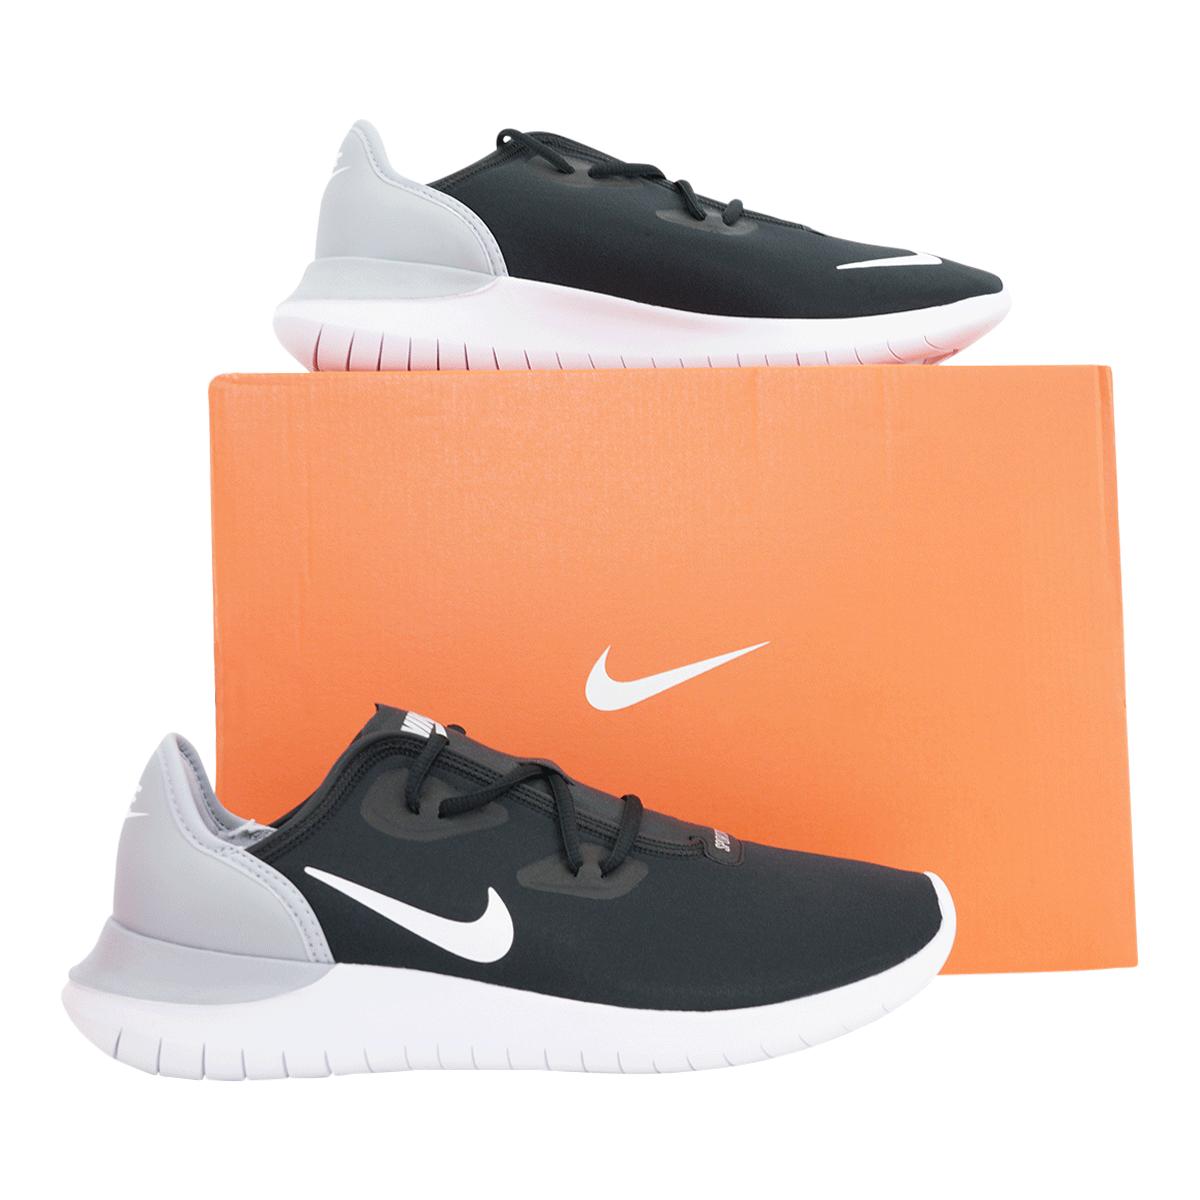 Nike-Men-039-s-Hakata-Running-Shoes thumbnail 7